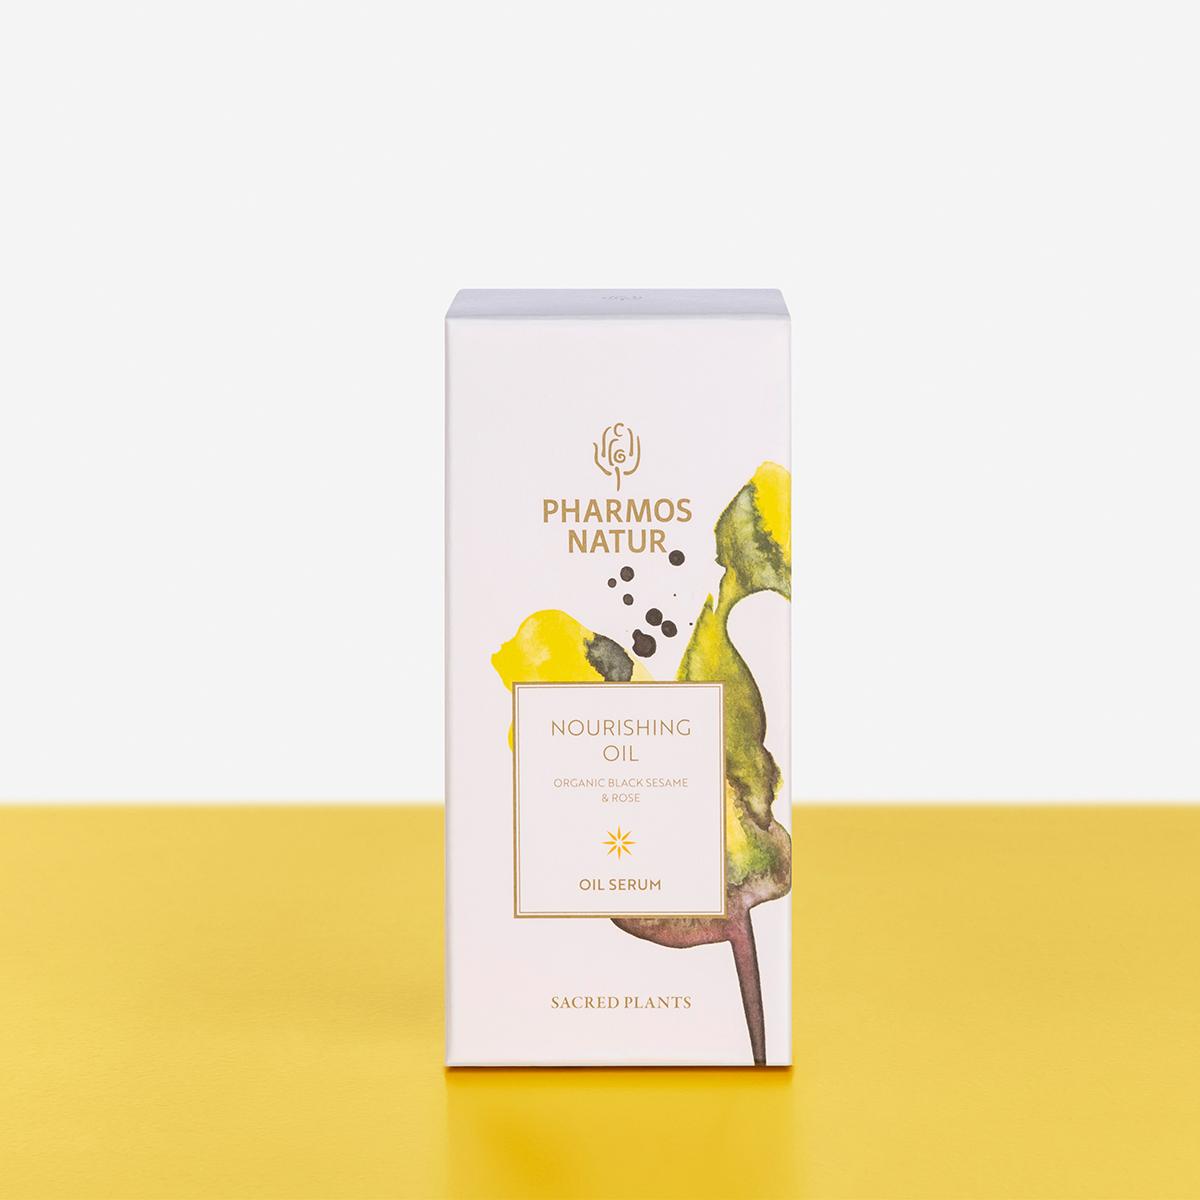 Verpackung Nourishing Oil Produktbild